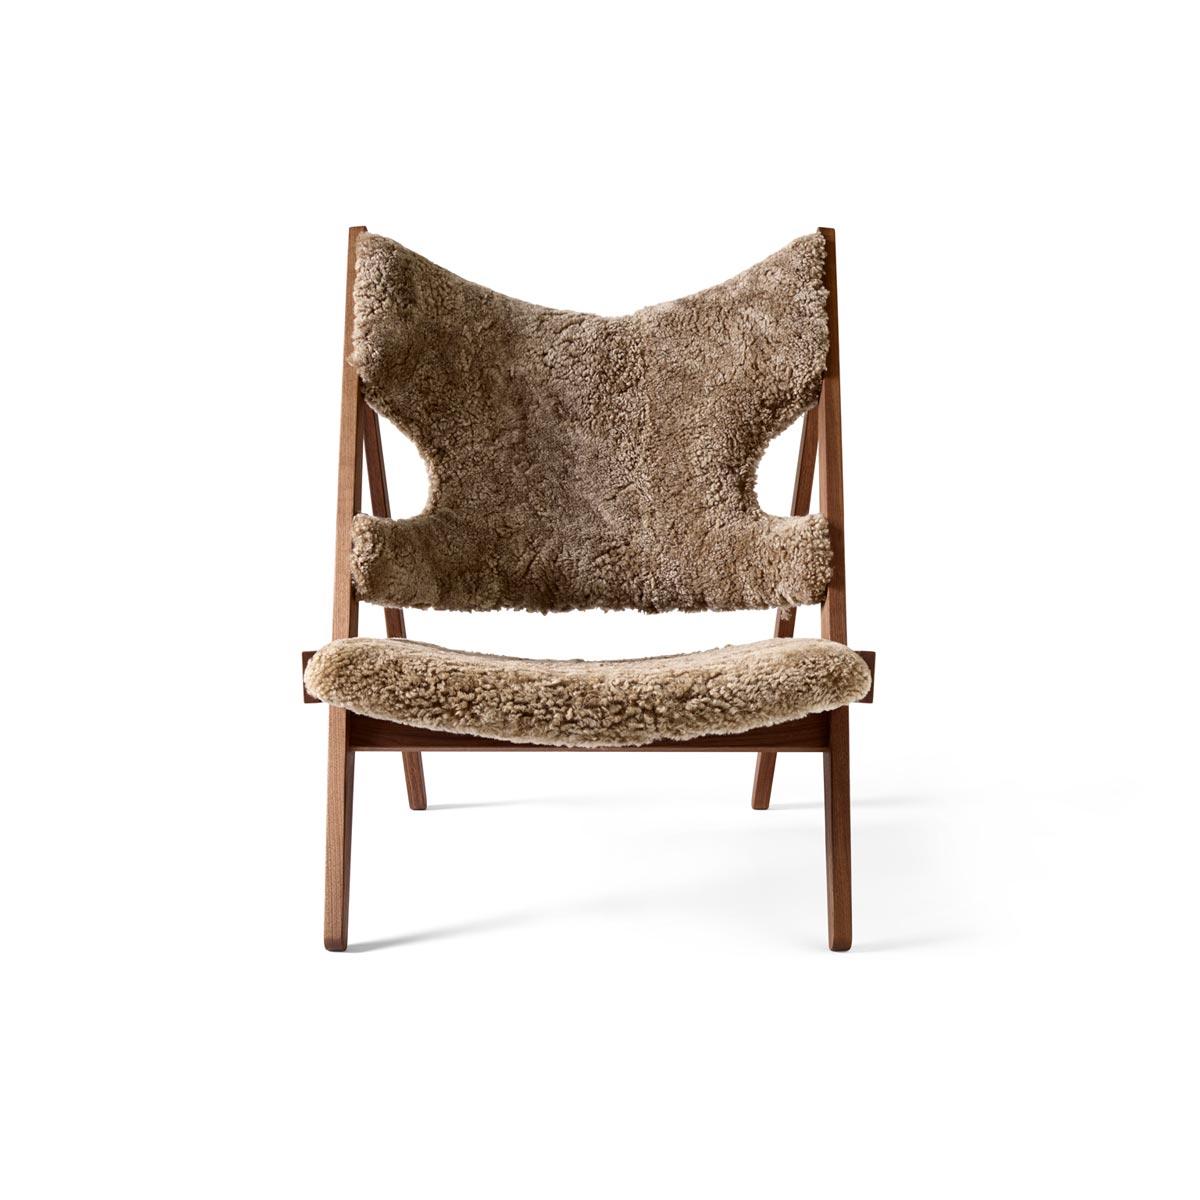 9682919 Knitting Lounge Chair Walnut Cork 19 Front 1